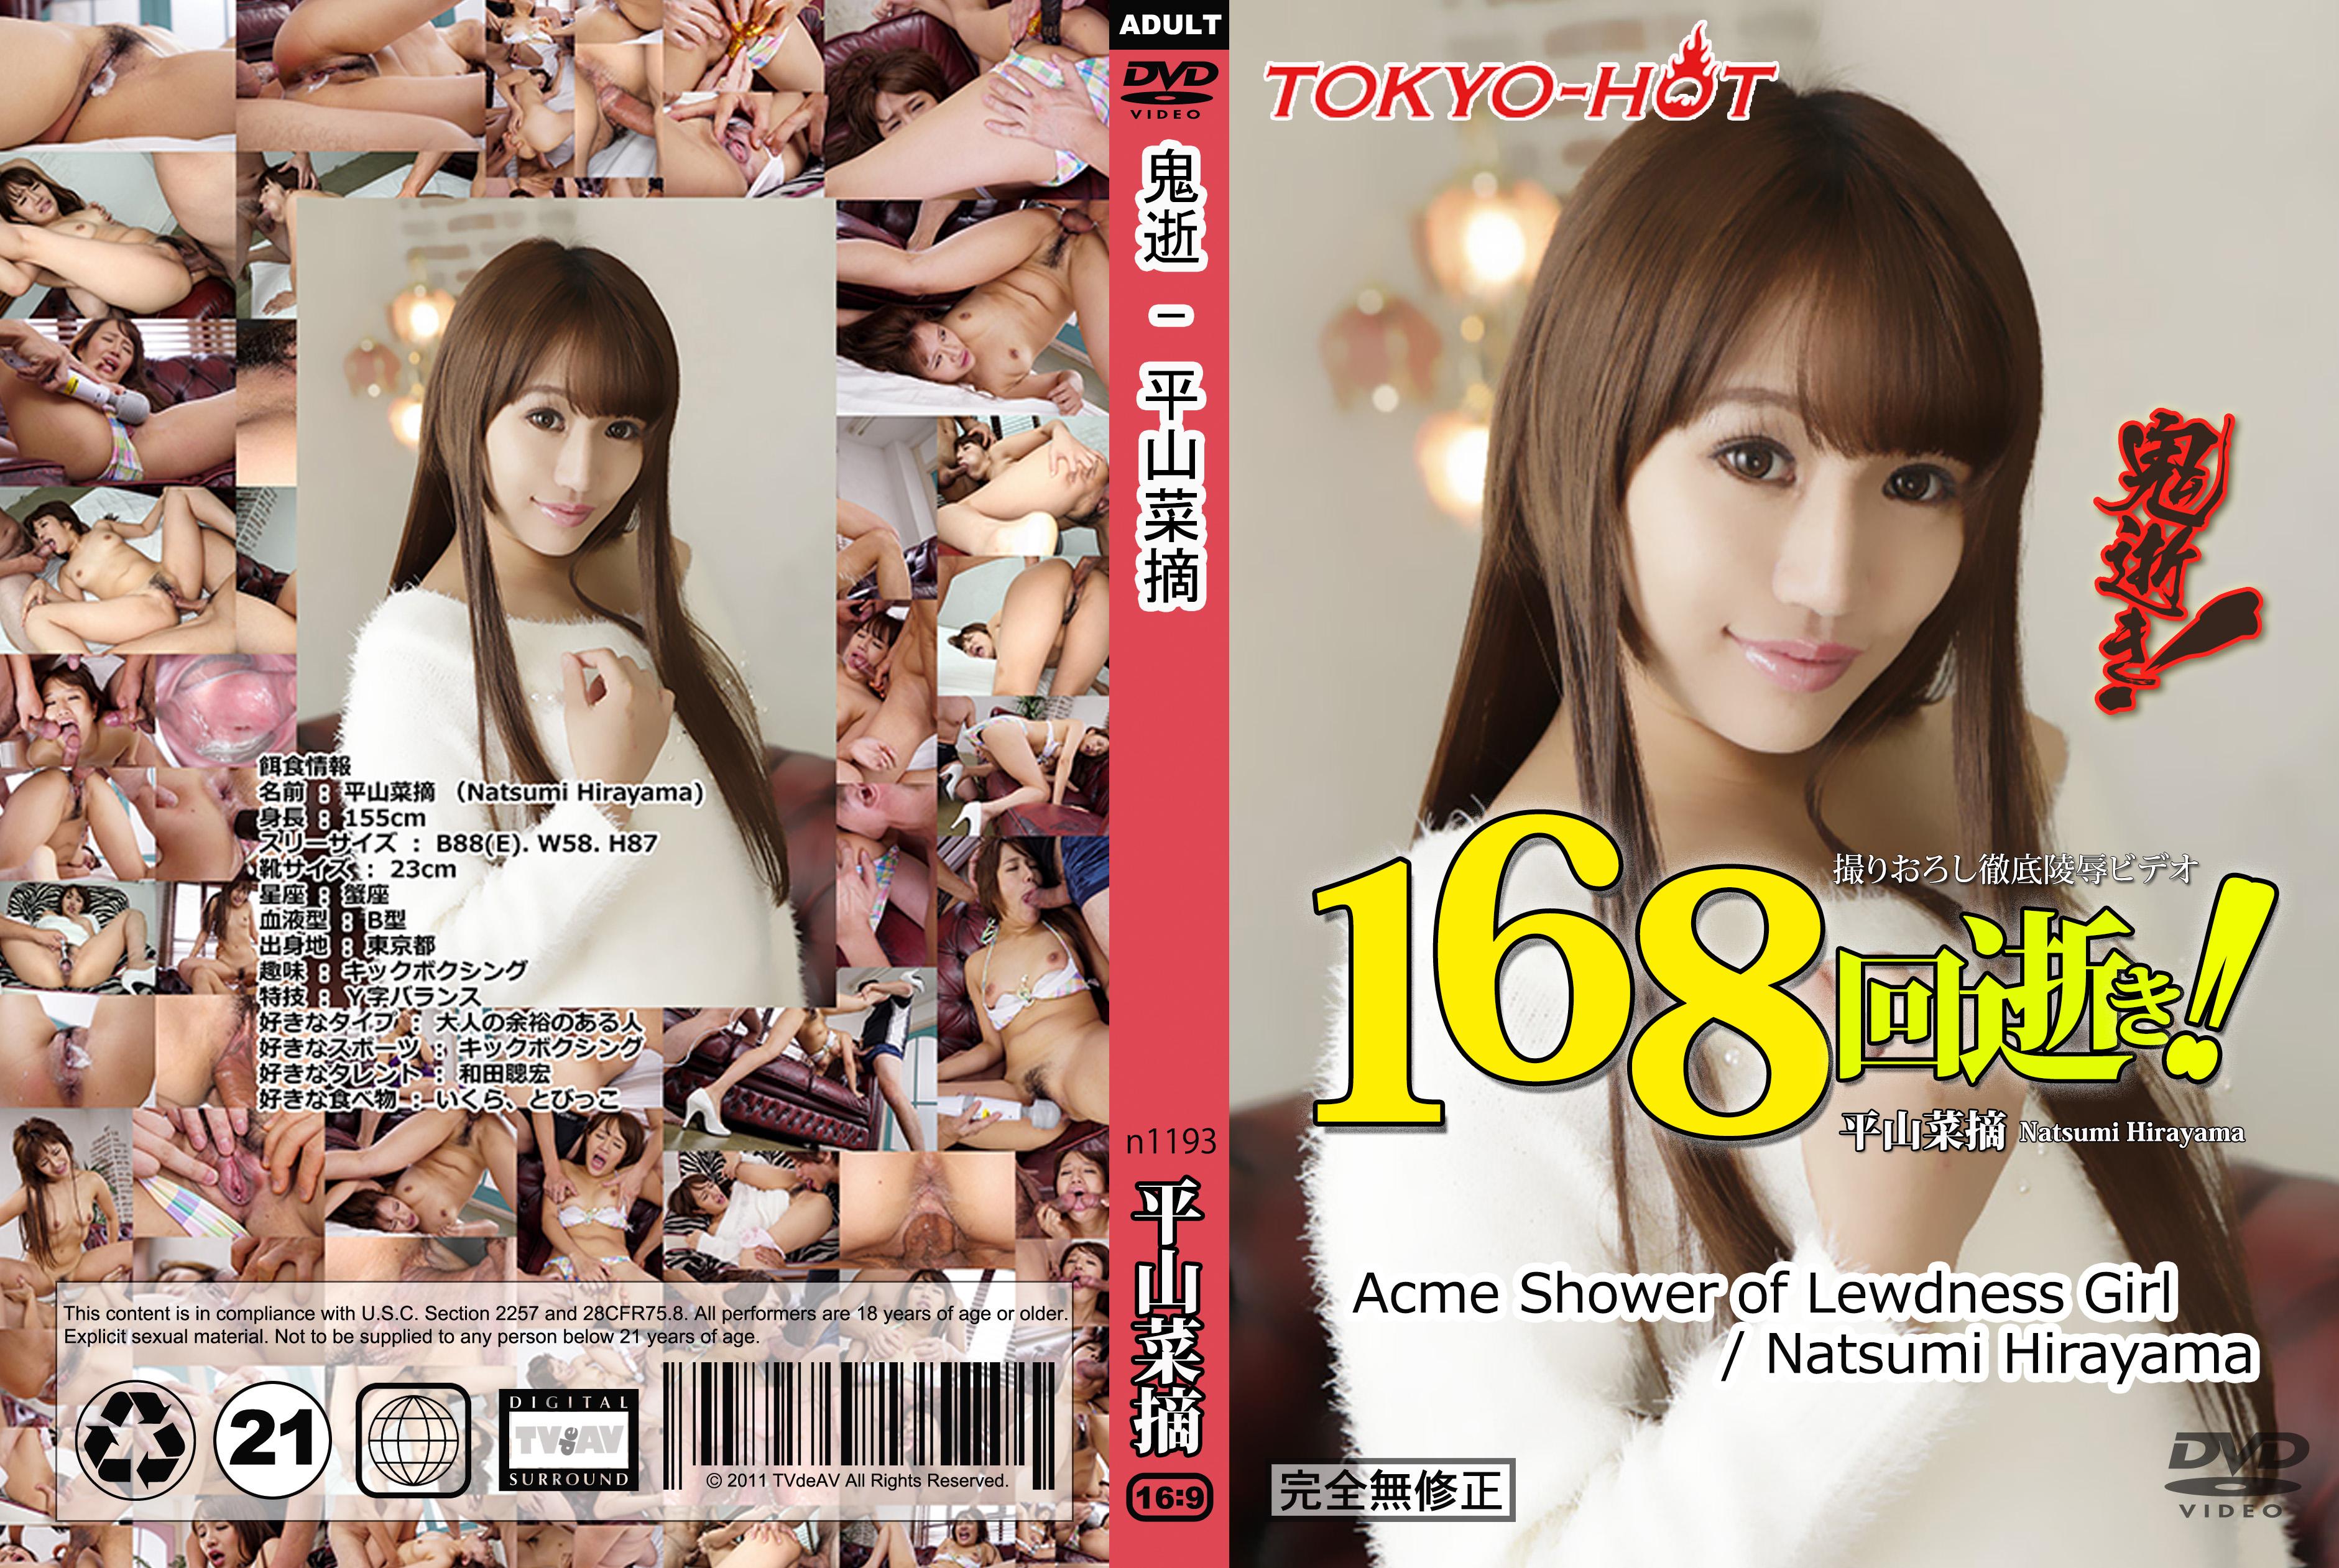 tokyo-hot-n1193-鬼逝 - 平山菜摘